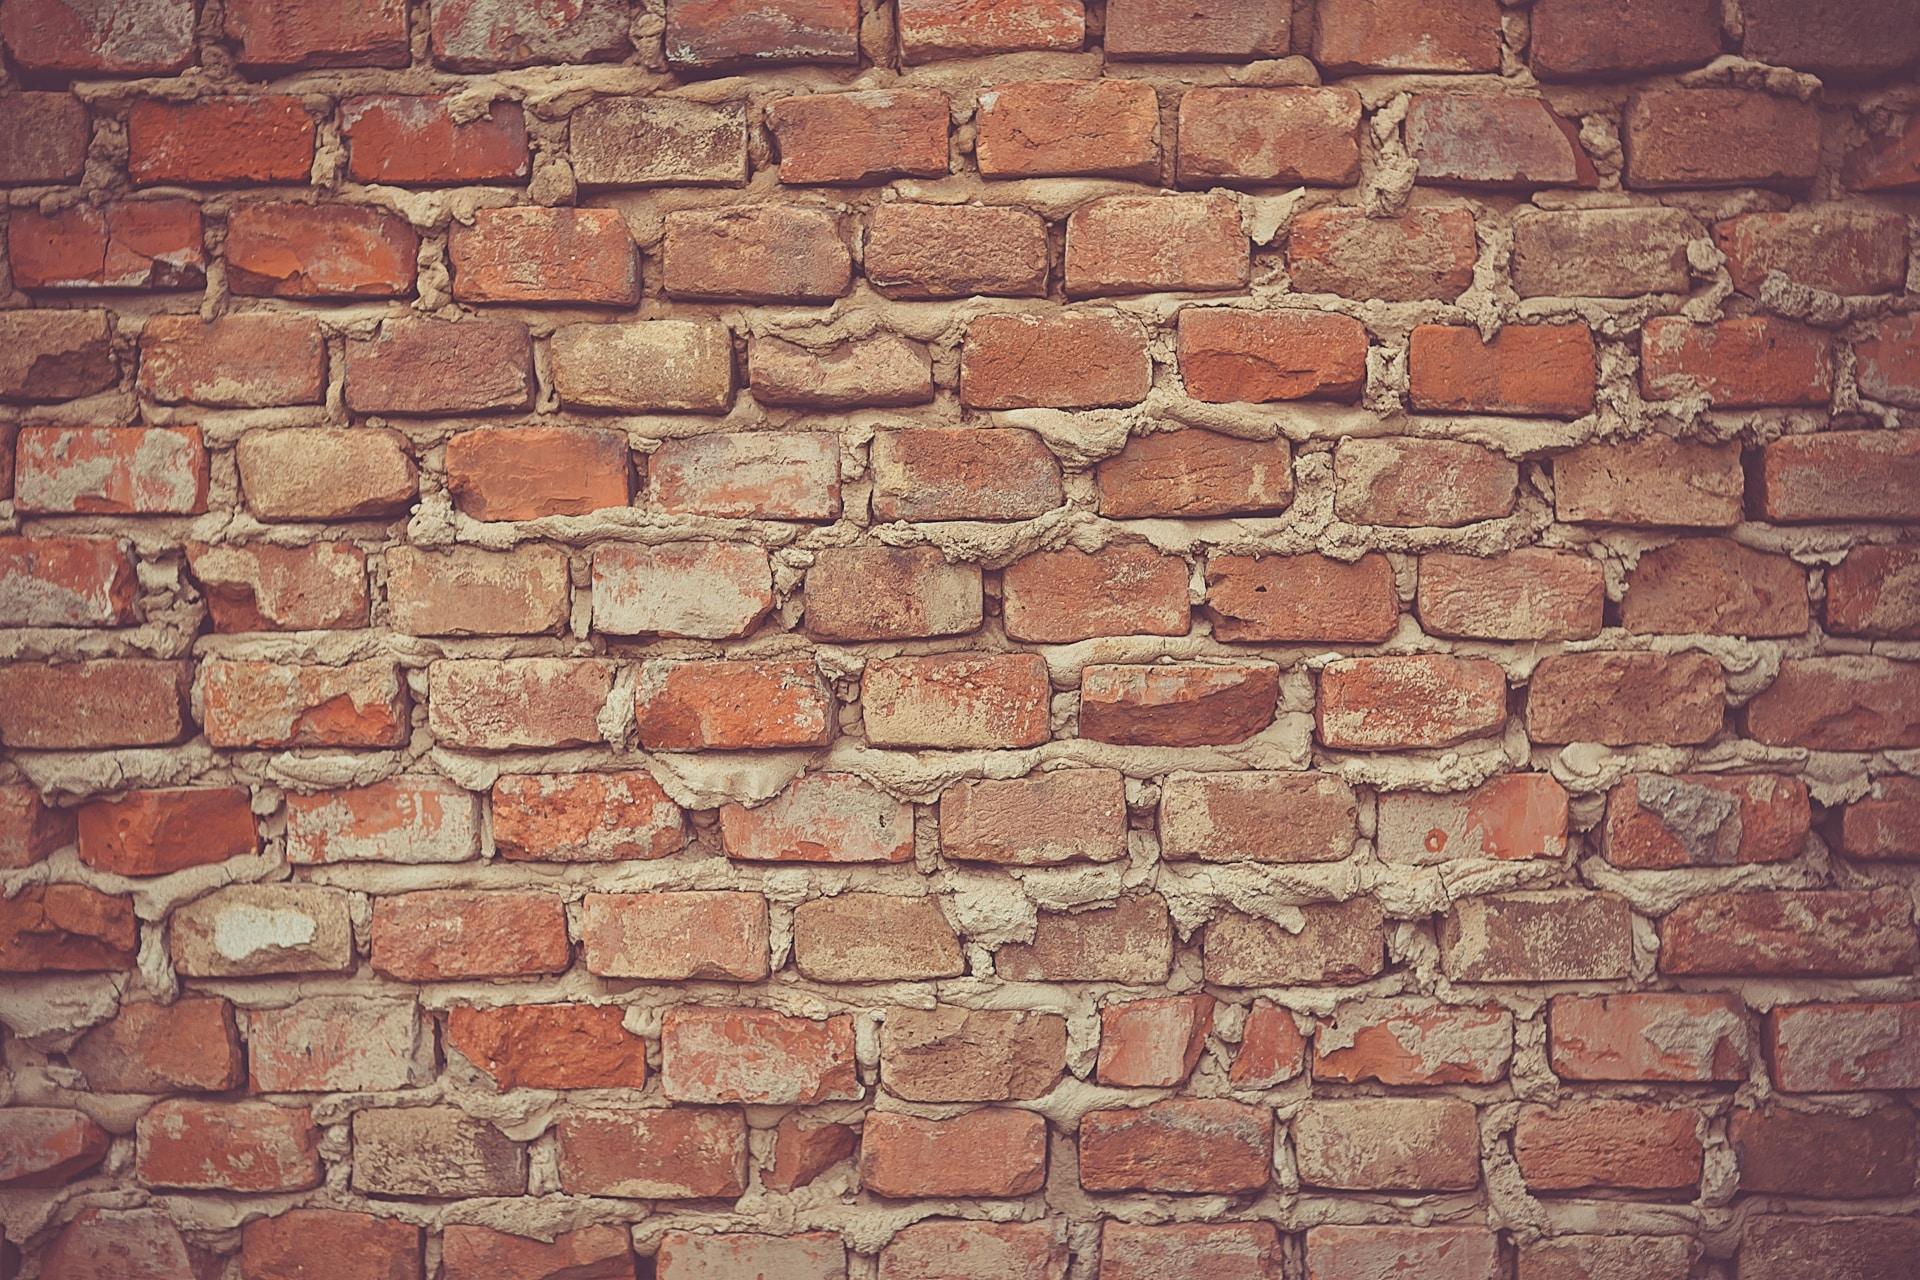 brown concrete bricks